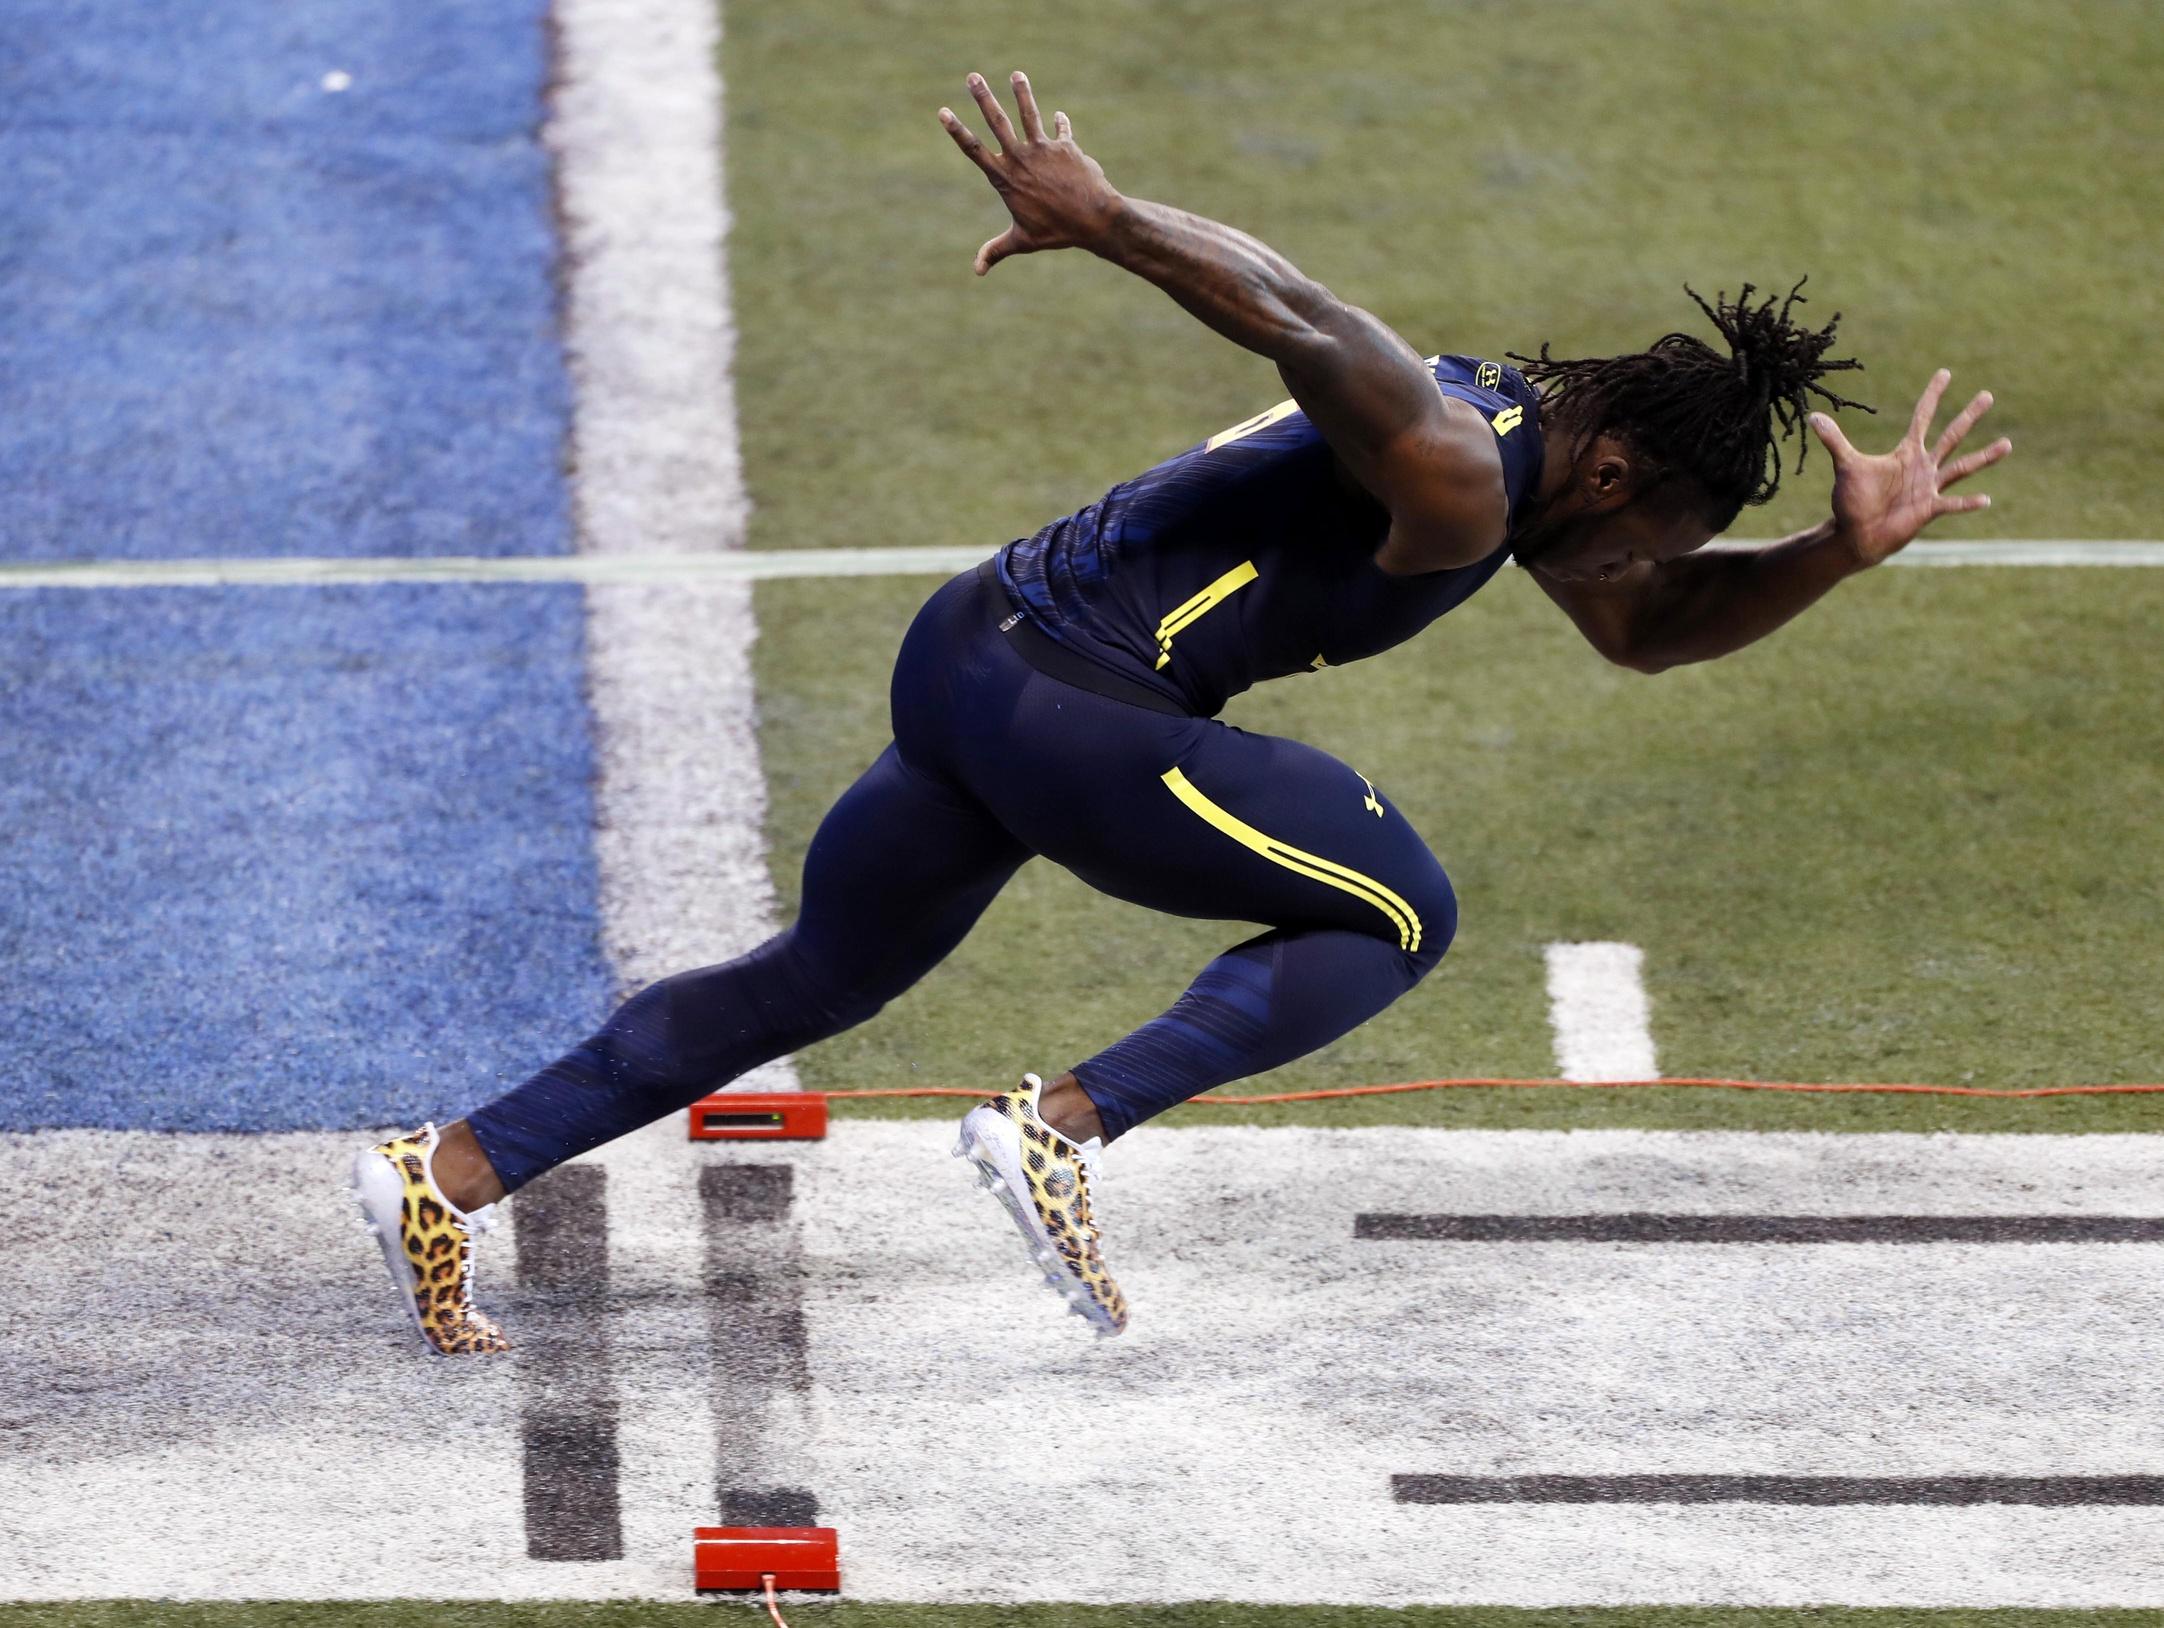 National Football League prospect: Rape report 'completely false,' skipping draft